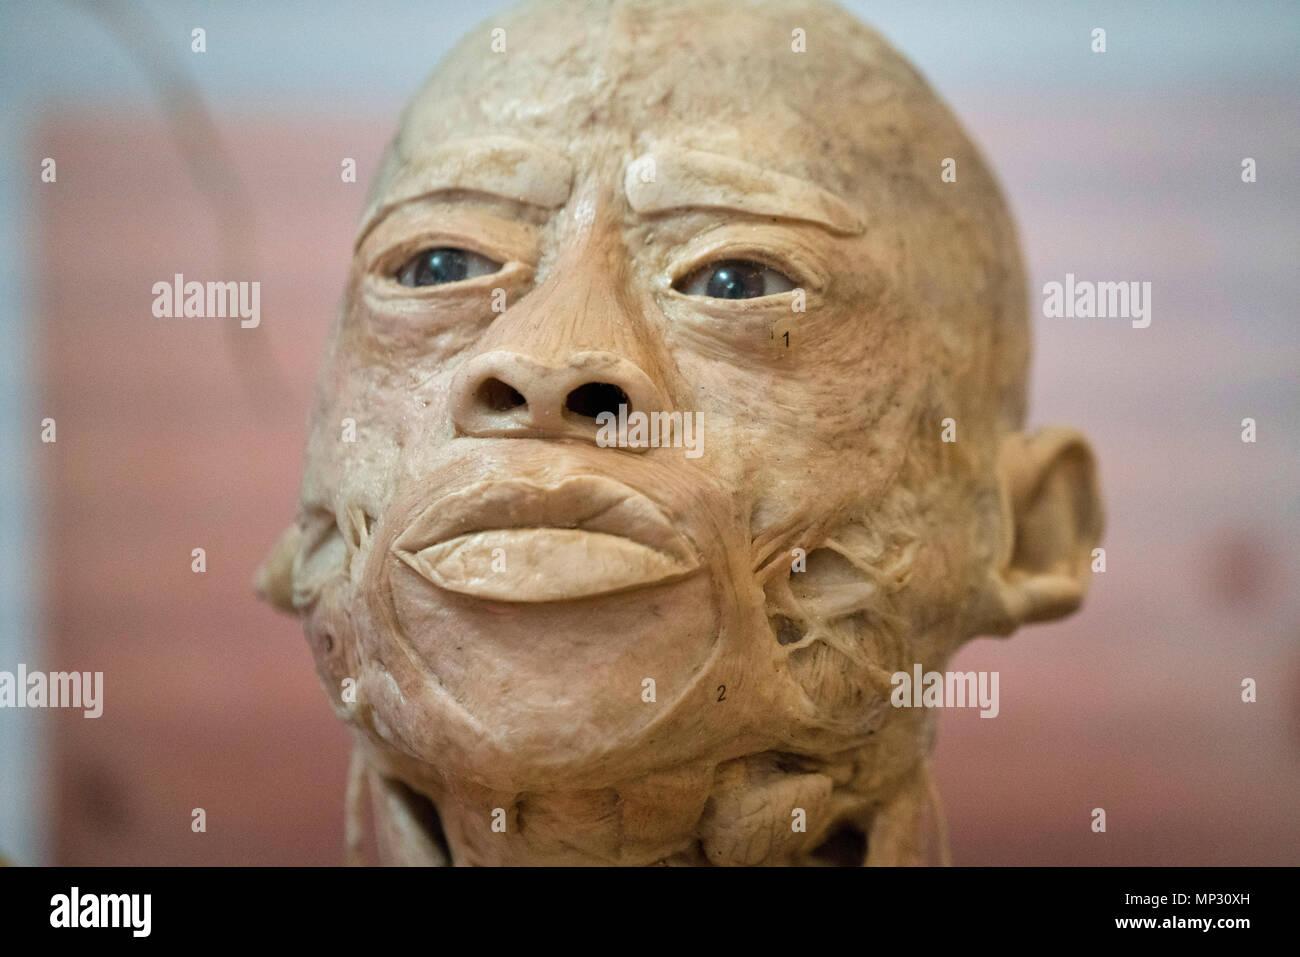 Anatomy Of A Real Human Head Stock Photo 185692713 Alamy